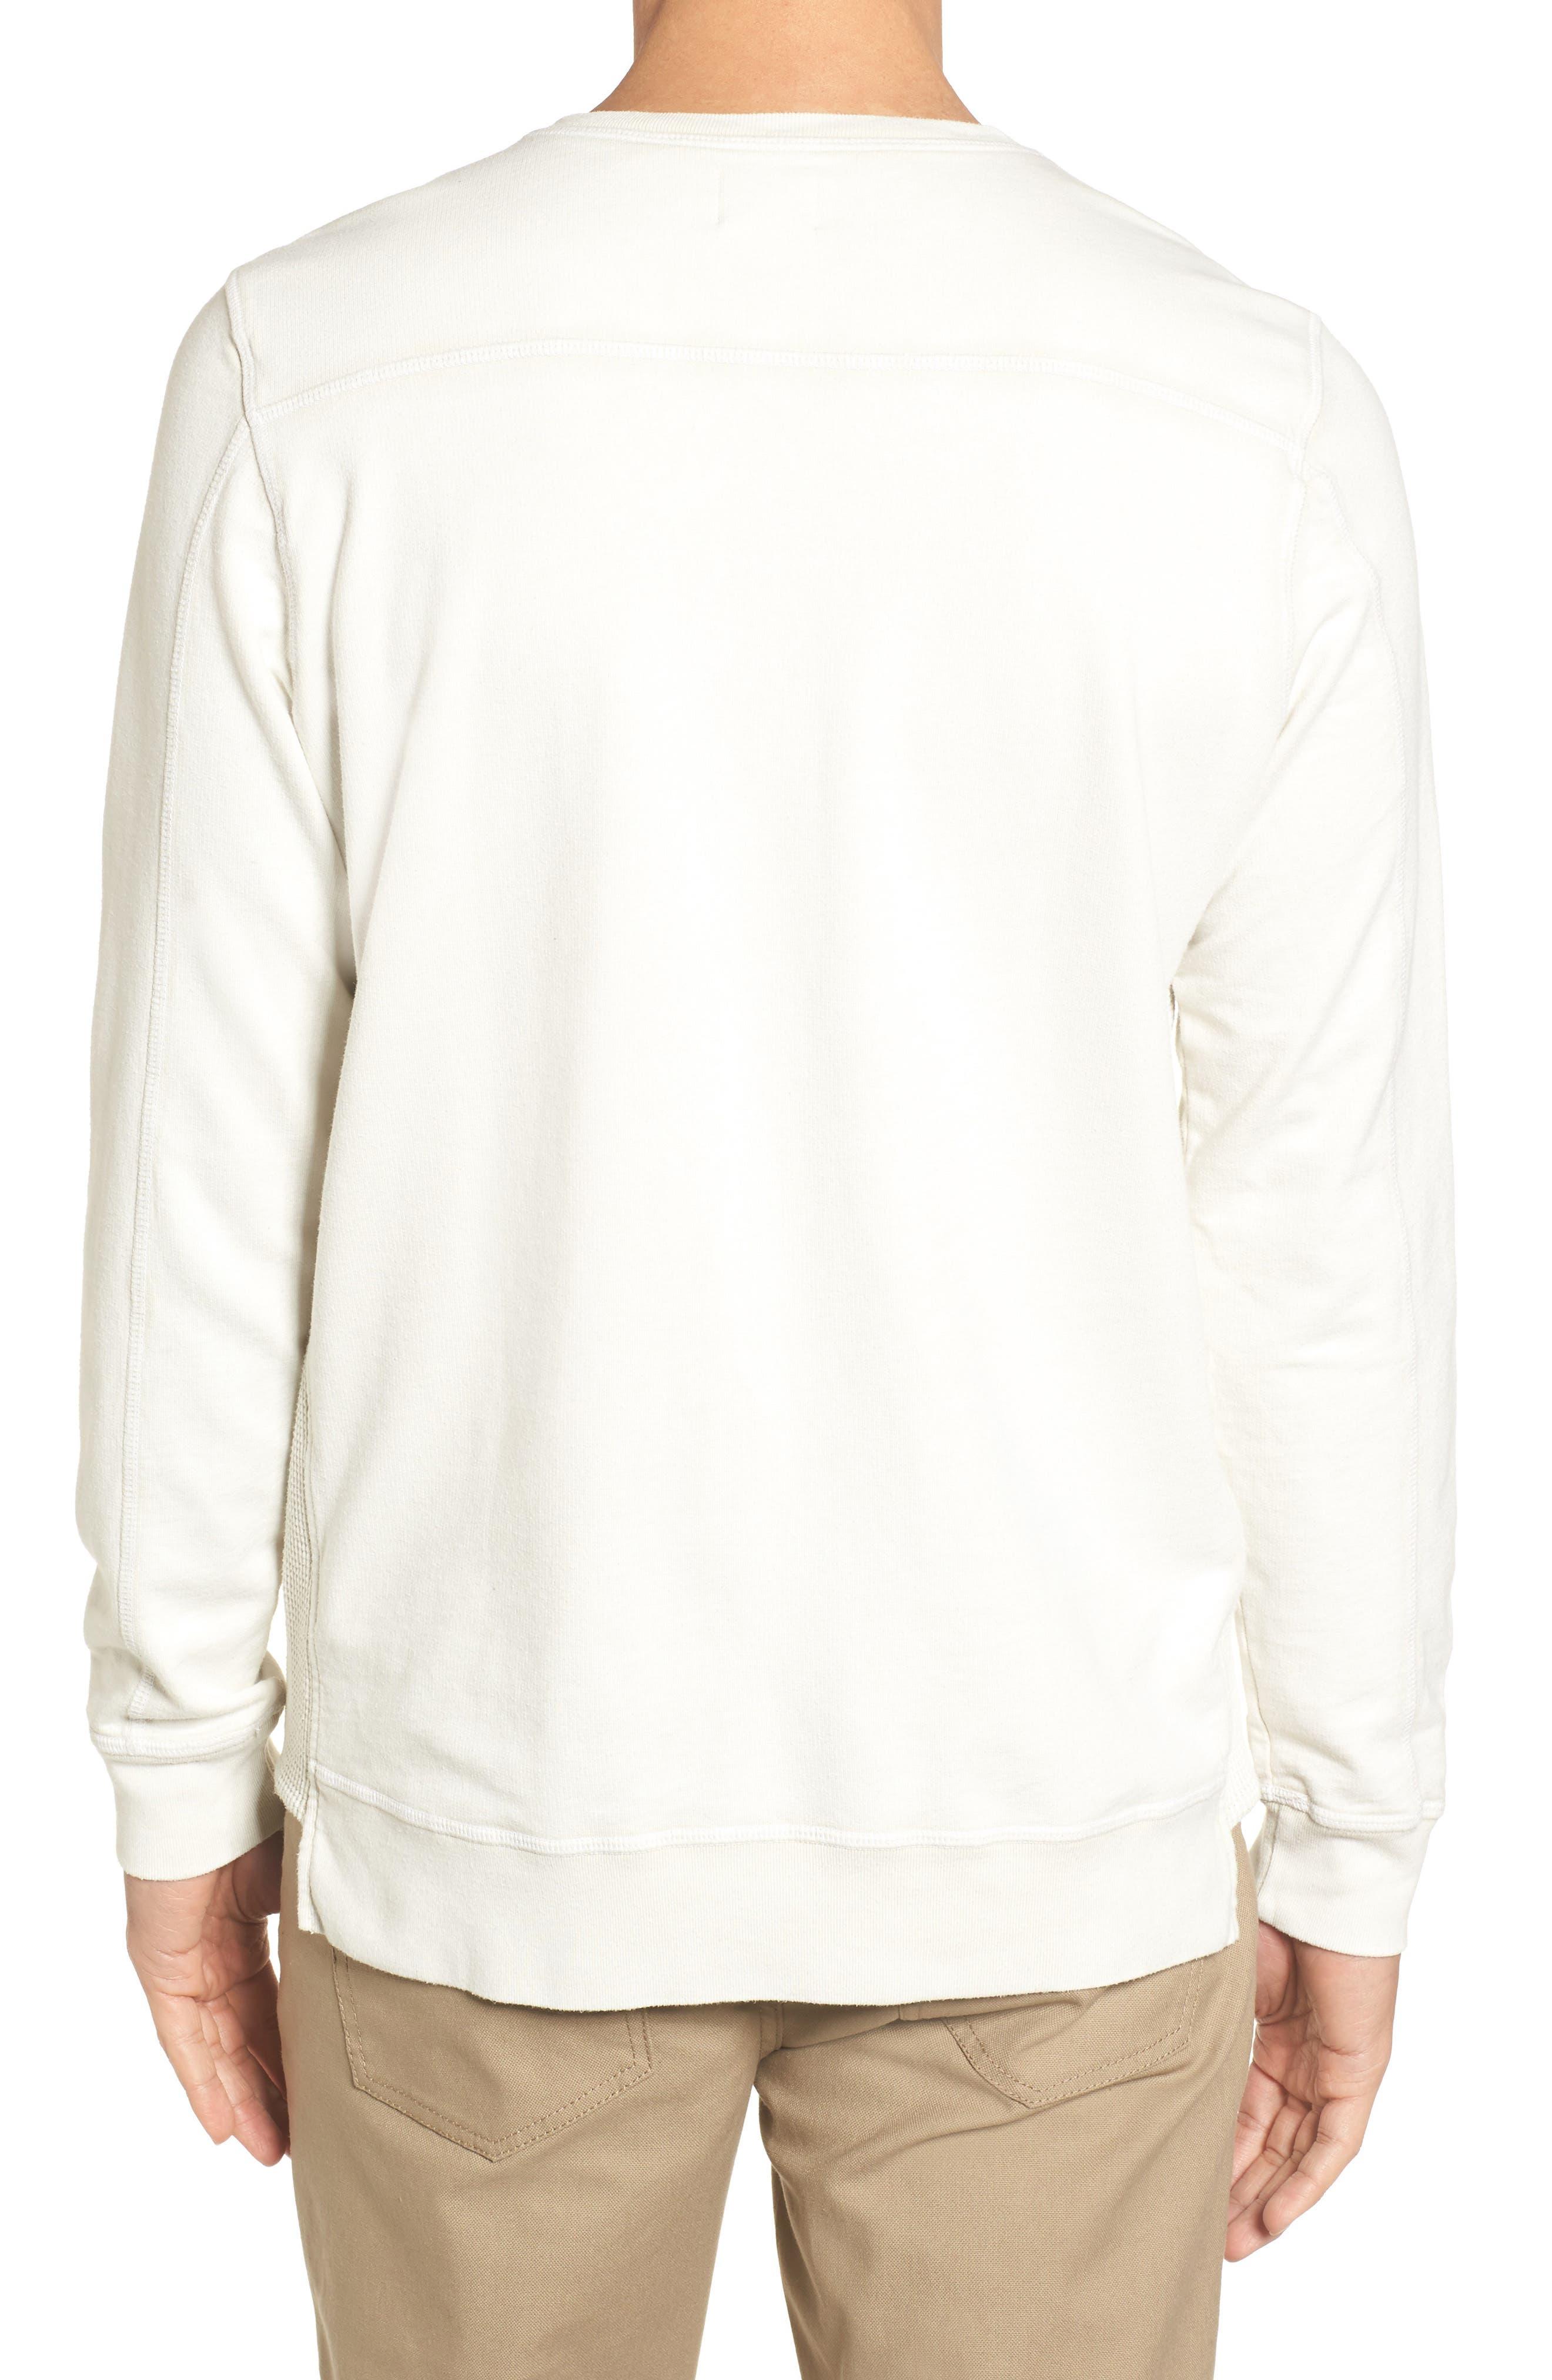 Max Slim Long Sleeve T-Shirt,                             Alternate thumbnail 2, color,                             Sunbaked Moonglade